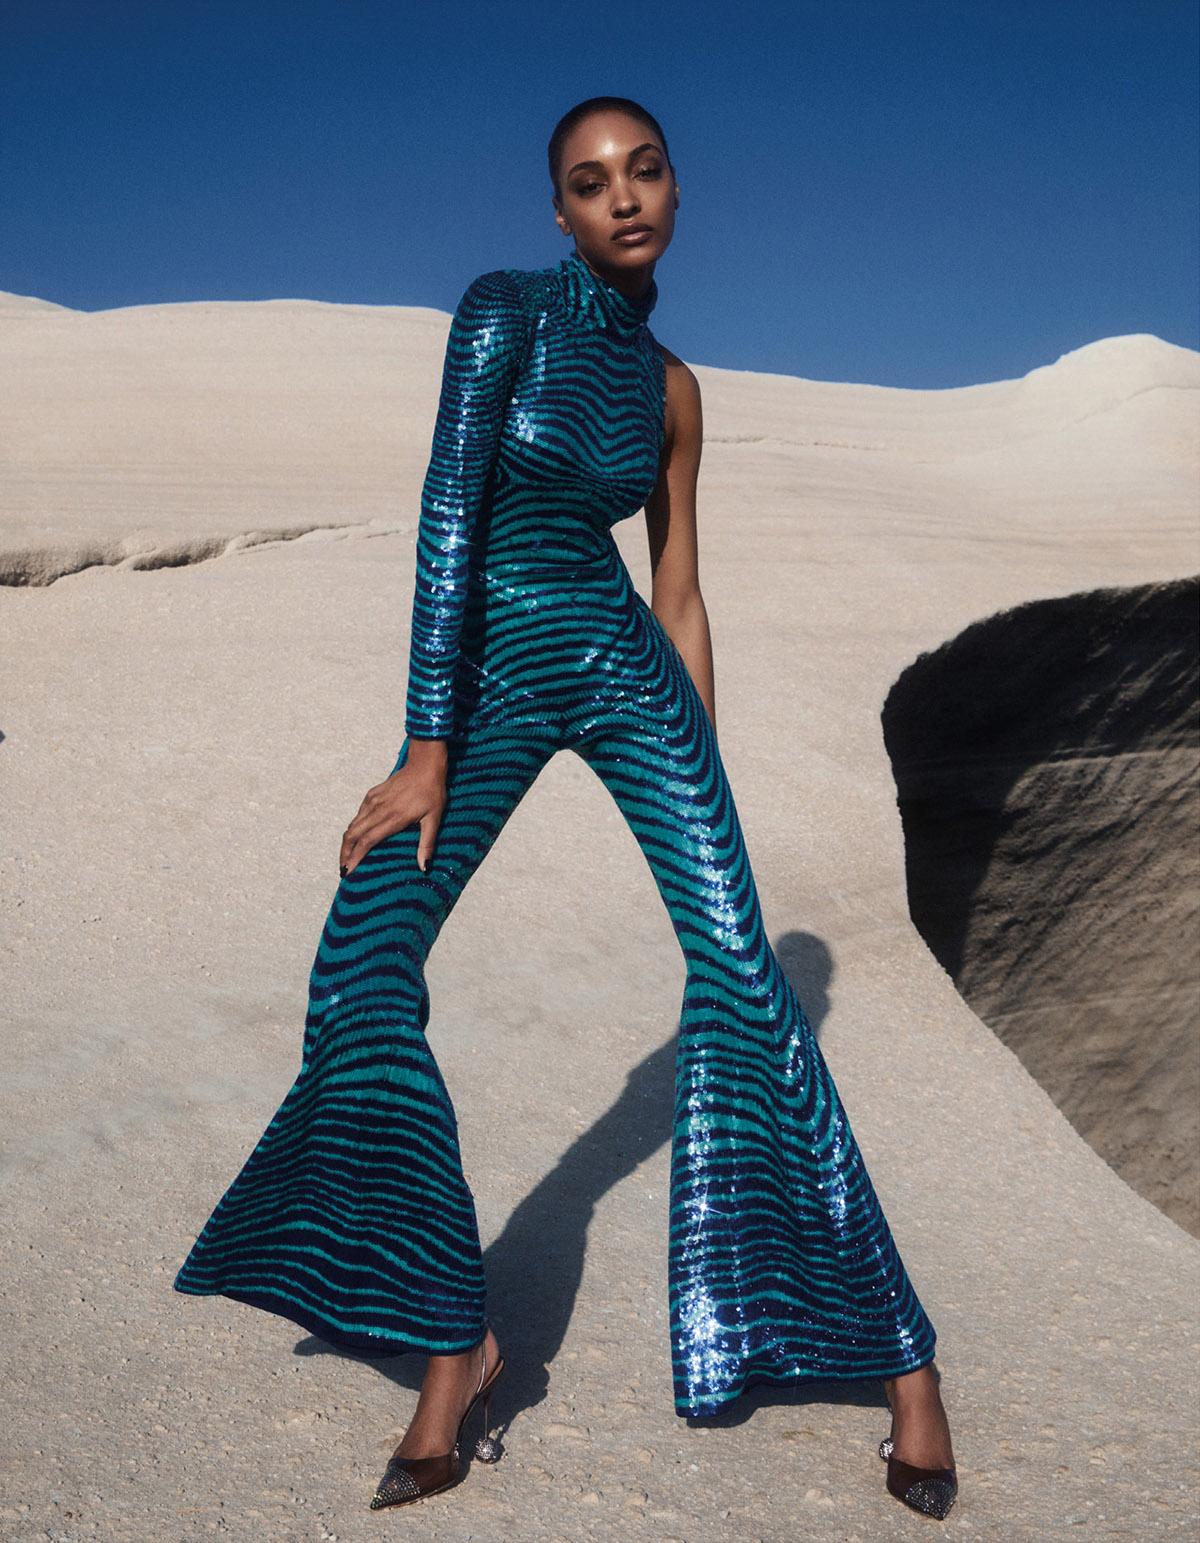 Jourdan Dunn covers Vogue Greece September 2021 by Alvaro Beamud Cortes